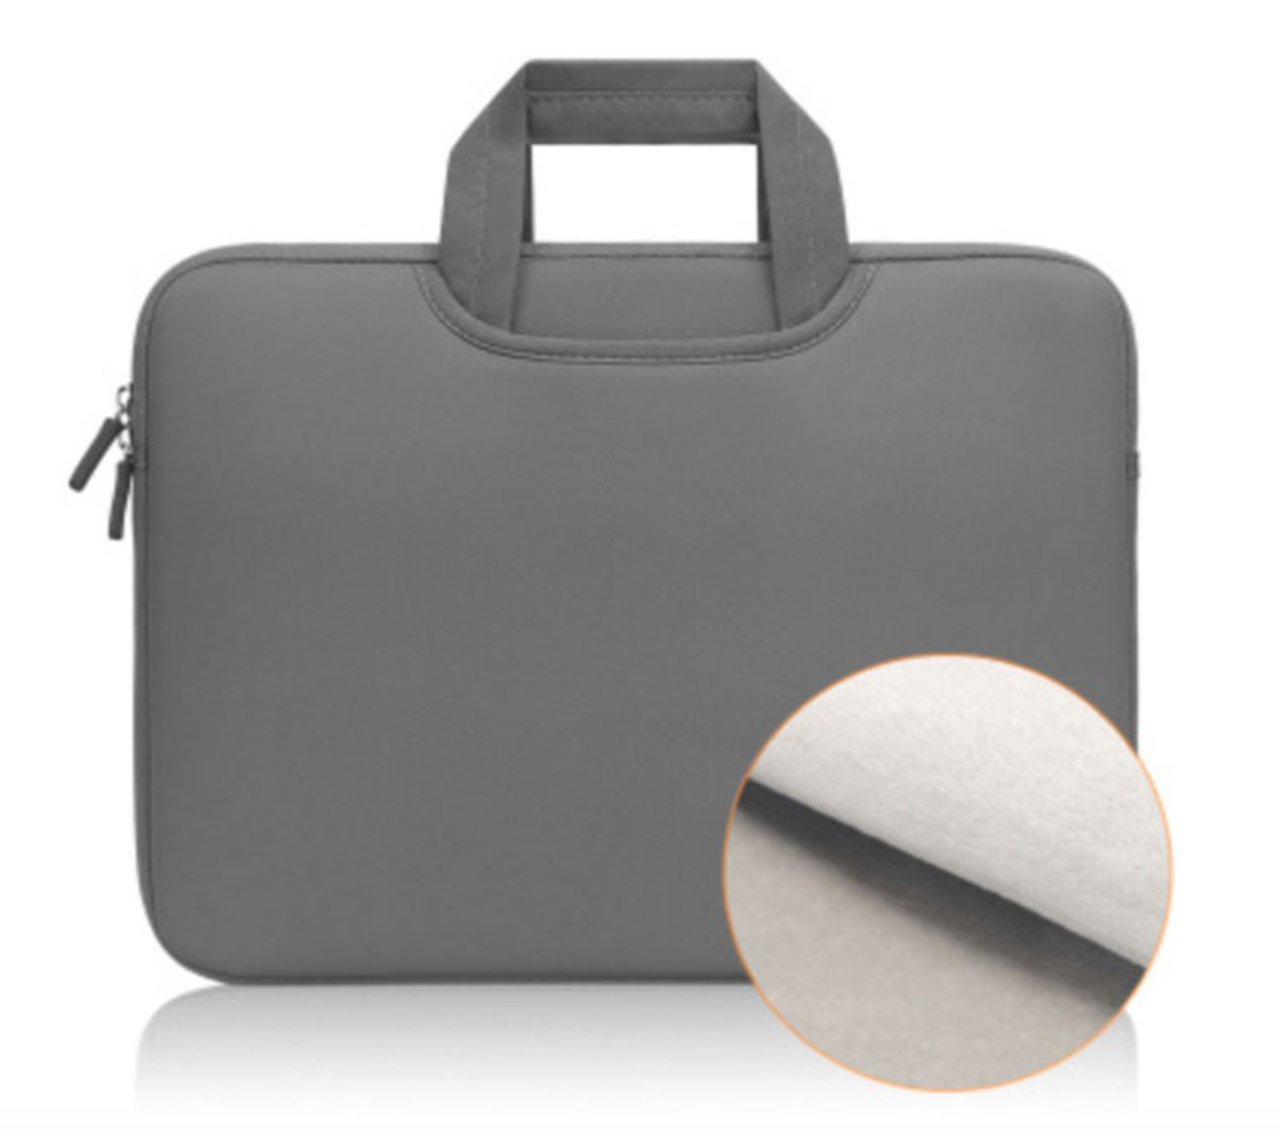 Неопреновая сумка-чехол для Макбук Macbook Air/Pro 13,3'' 2008-2020 - серый